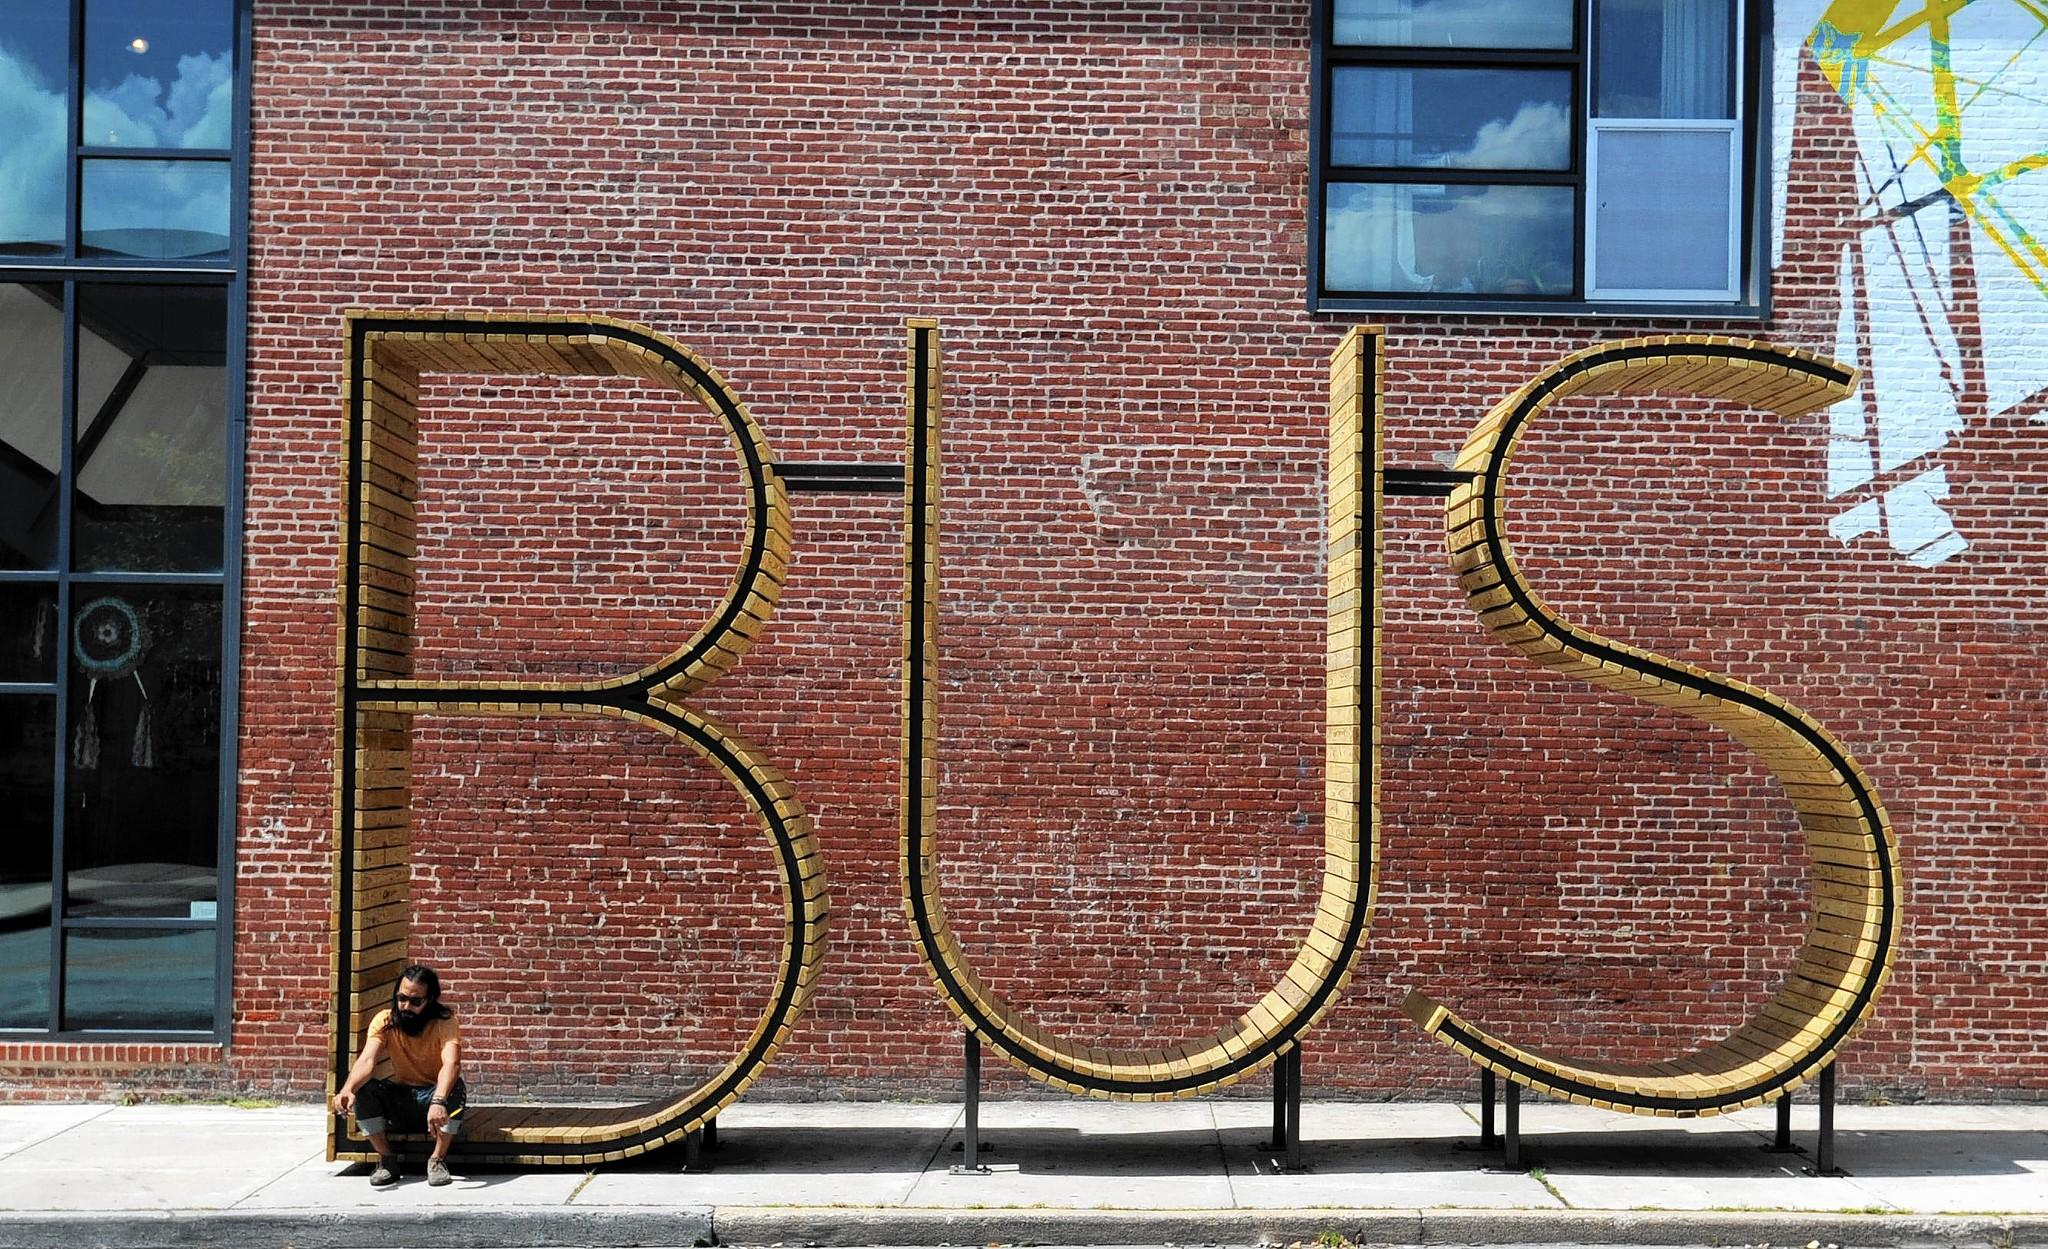 Artist Pablo Machioli takes a break in the B-U-S sculpture outside the Creative Alliance.